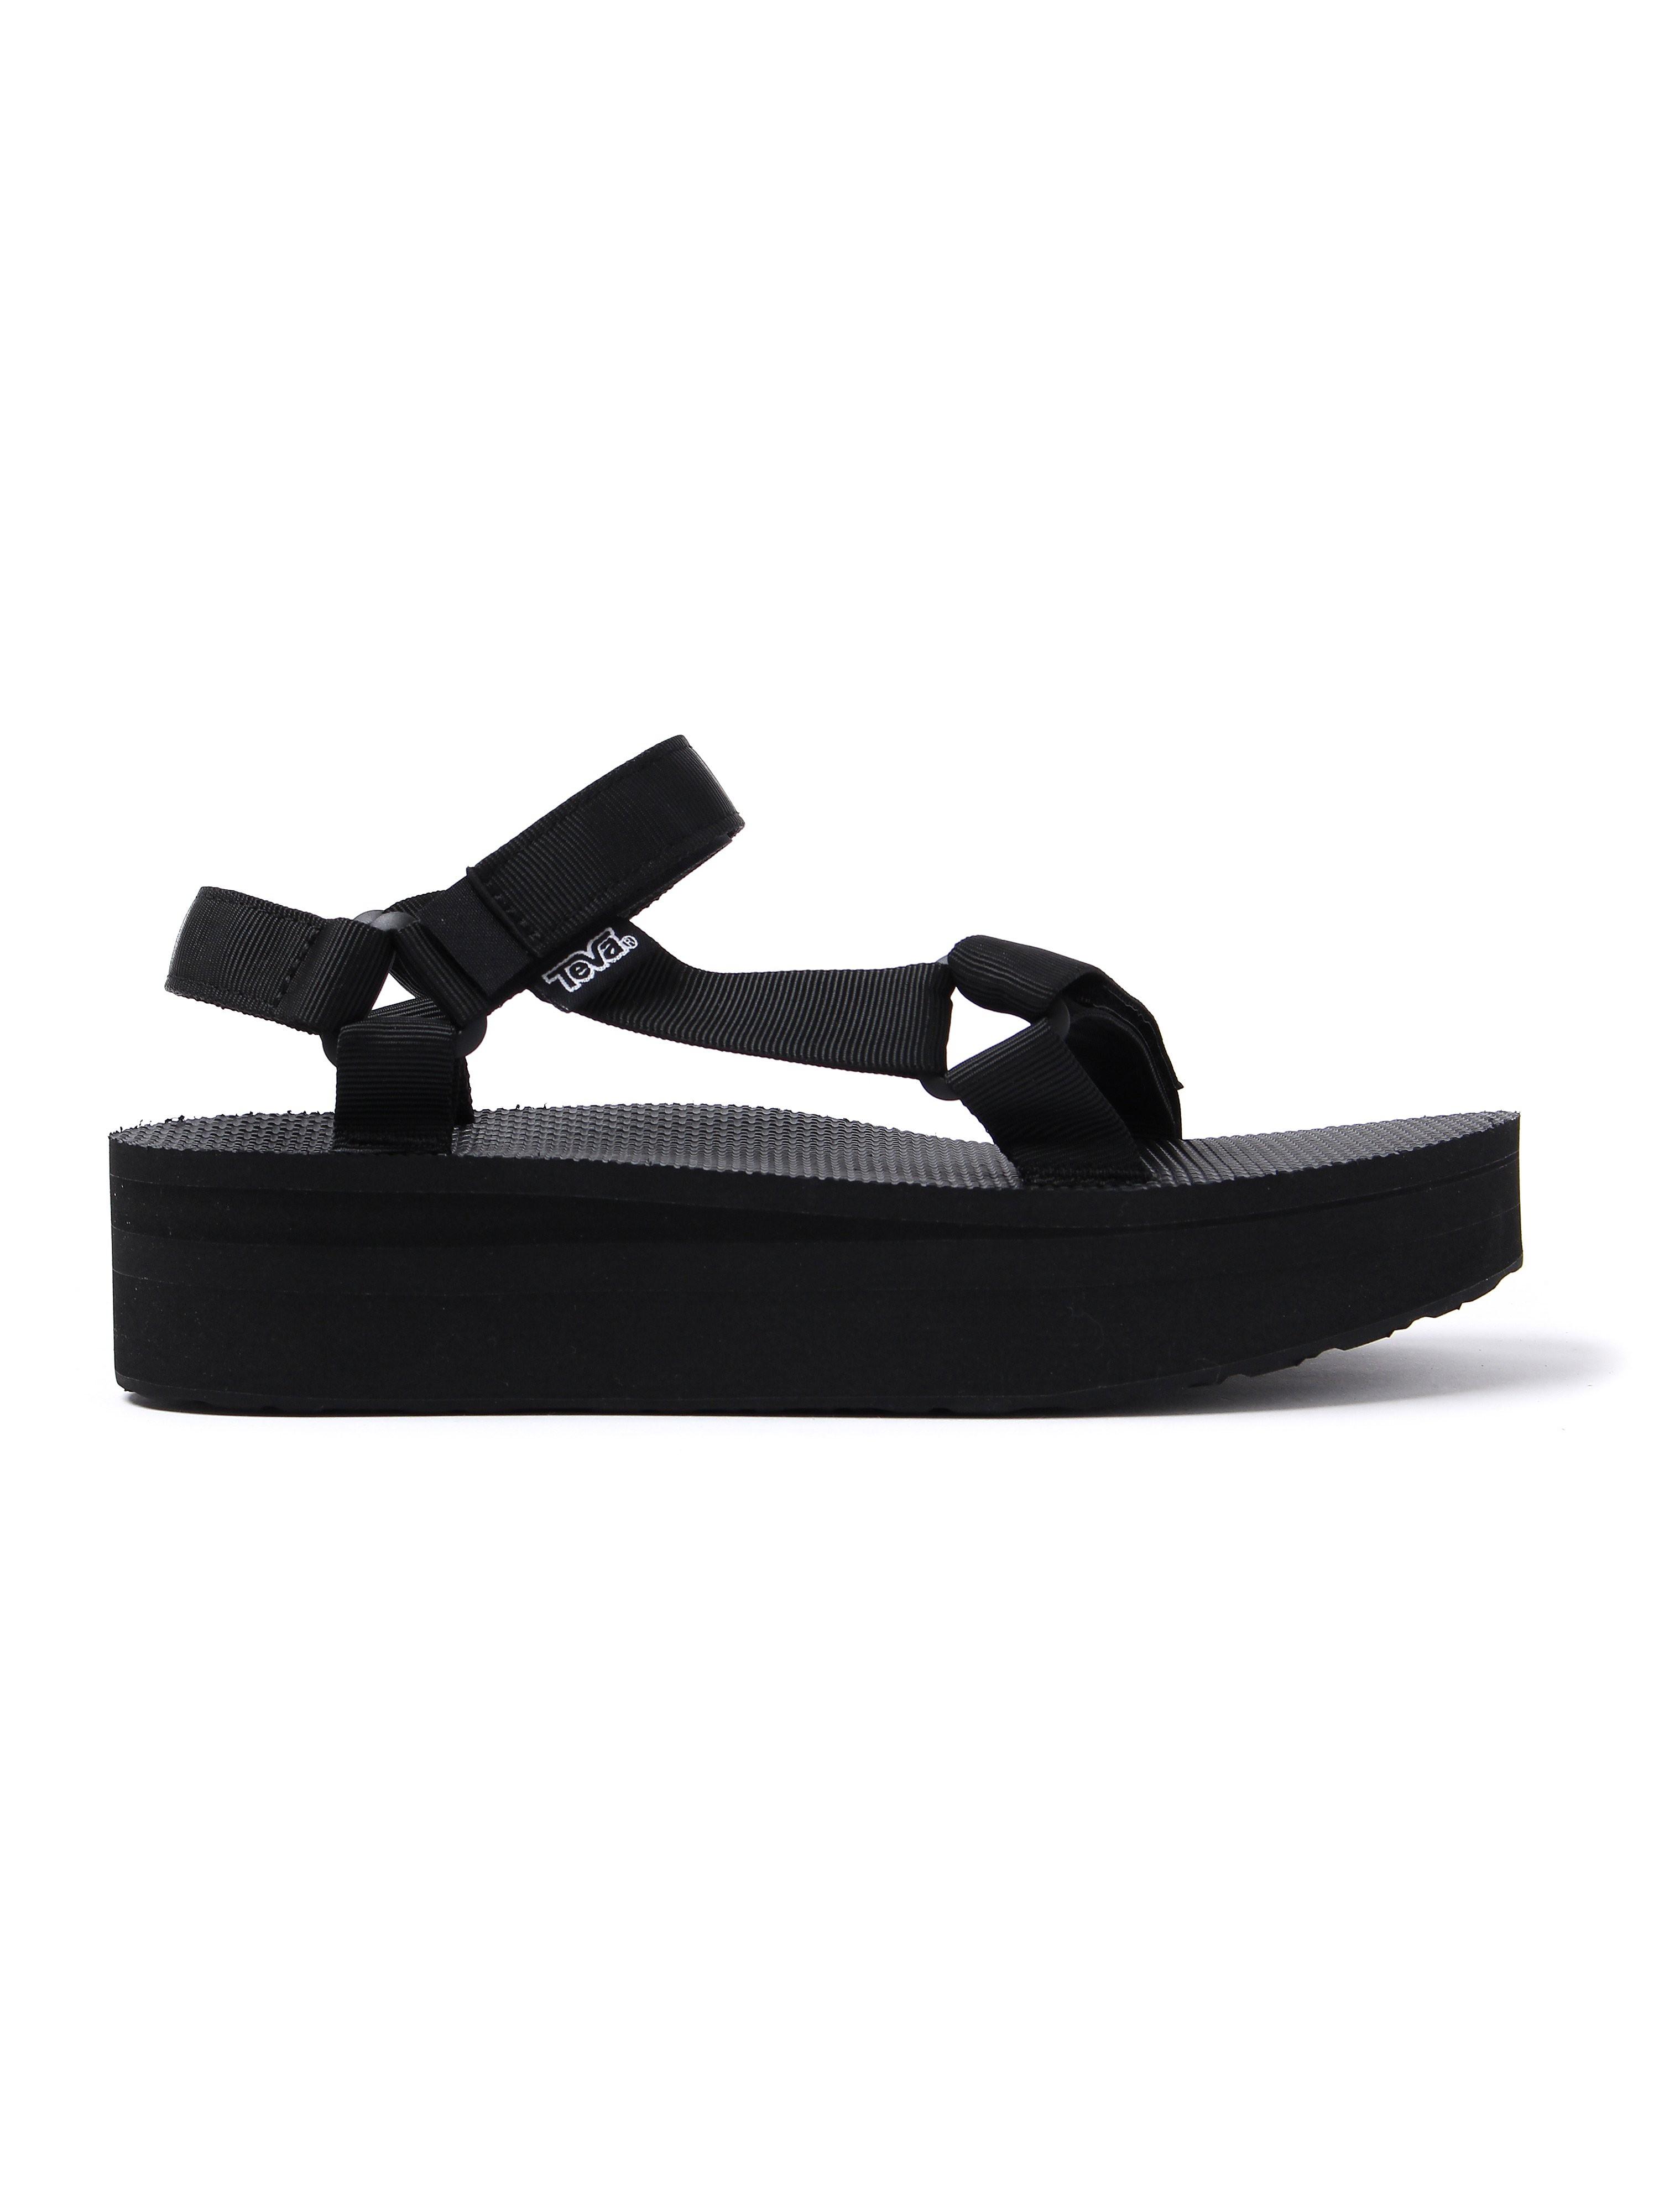 Teva Women's Flatform Universal Sandals - Black